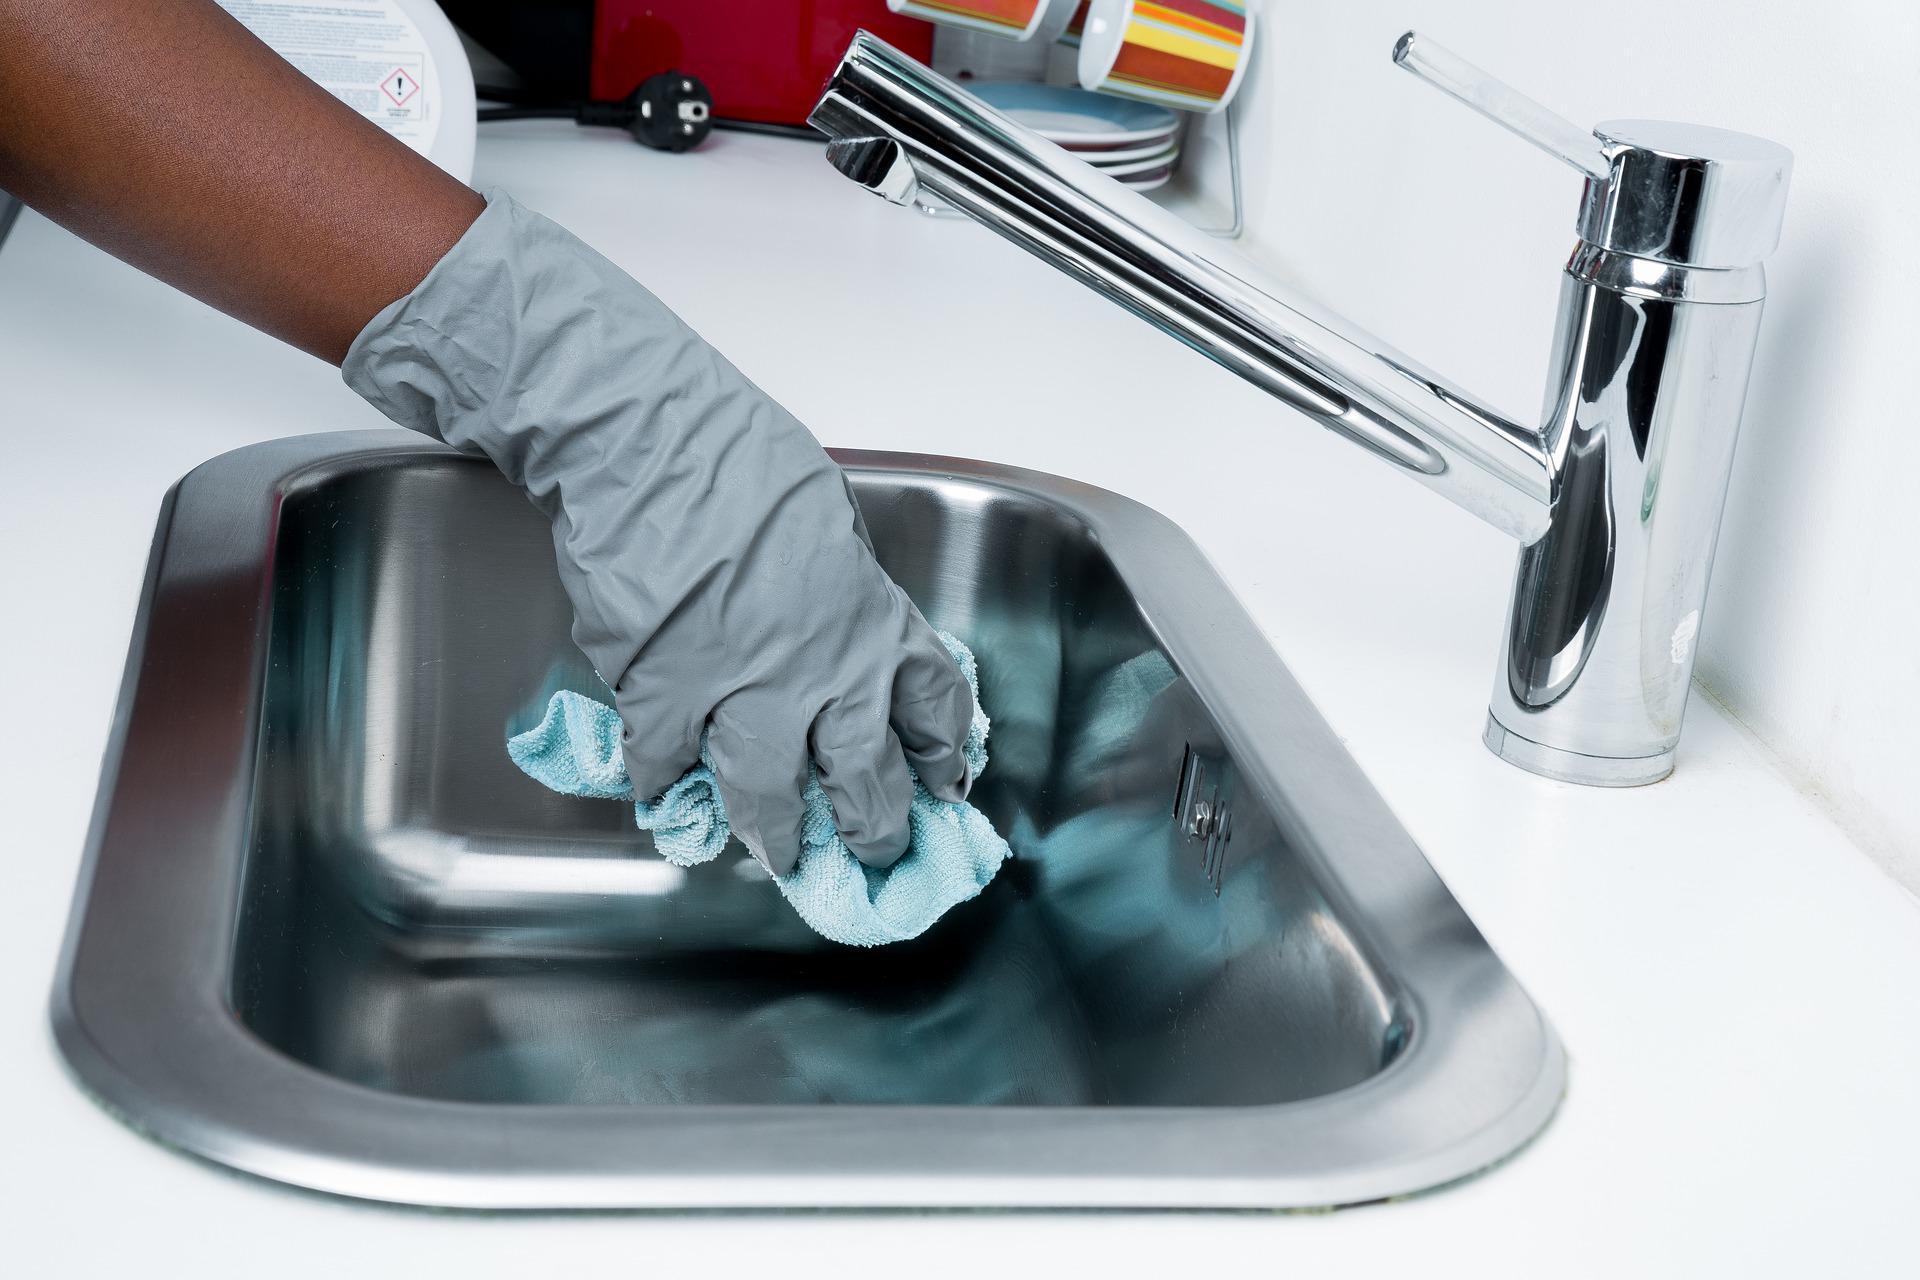 Kombinér knofedt og professionelle rengøringsmidler og opnå skinnende rene resultater!